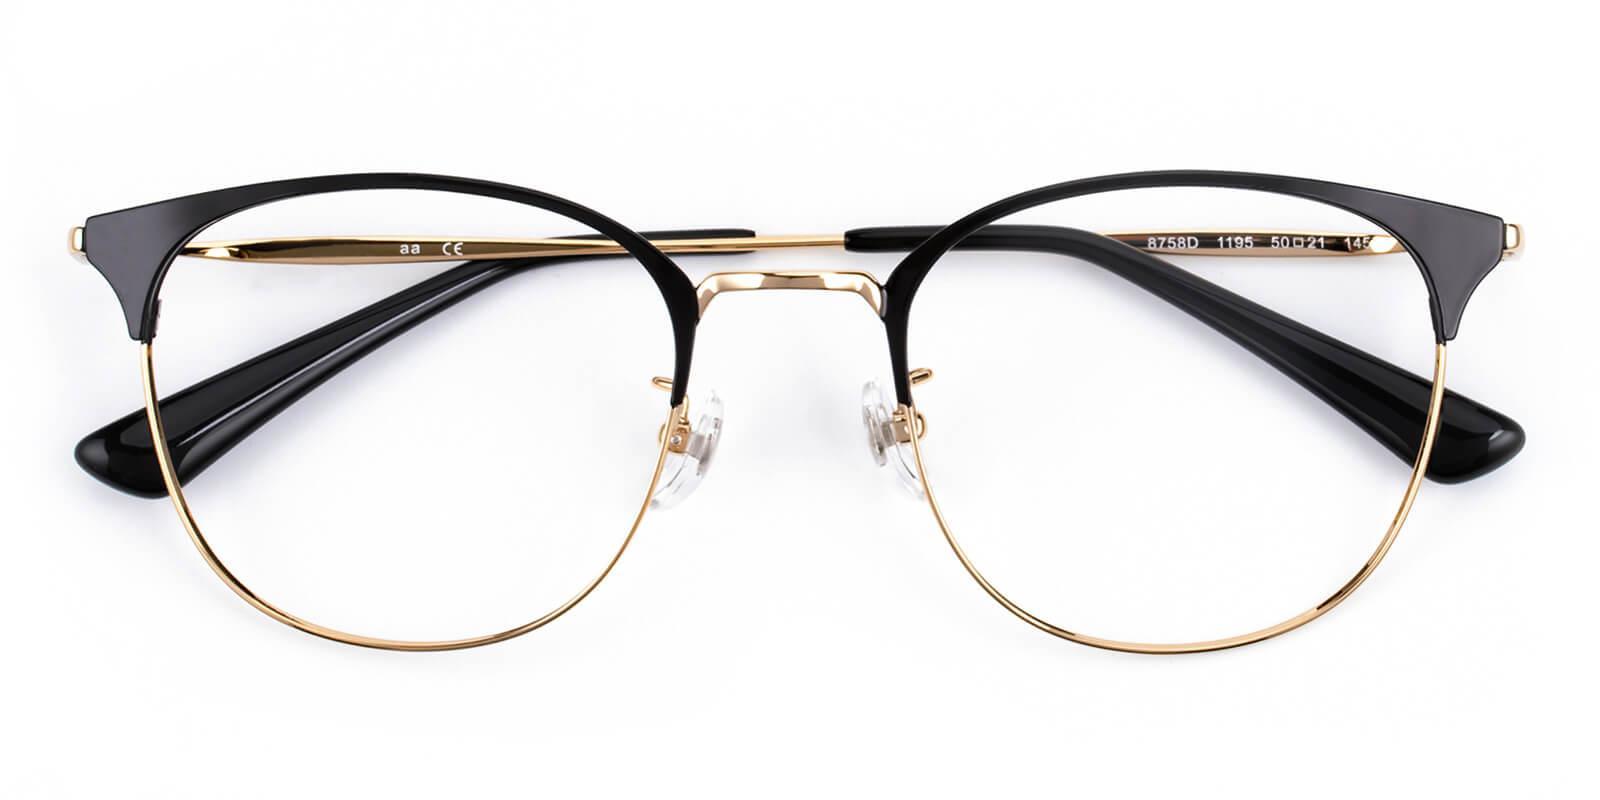 Belle-Gold-Cat-Titanium-Eyeglasses-detail